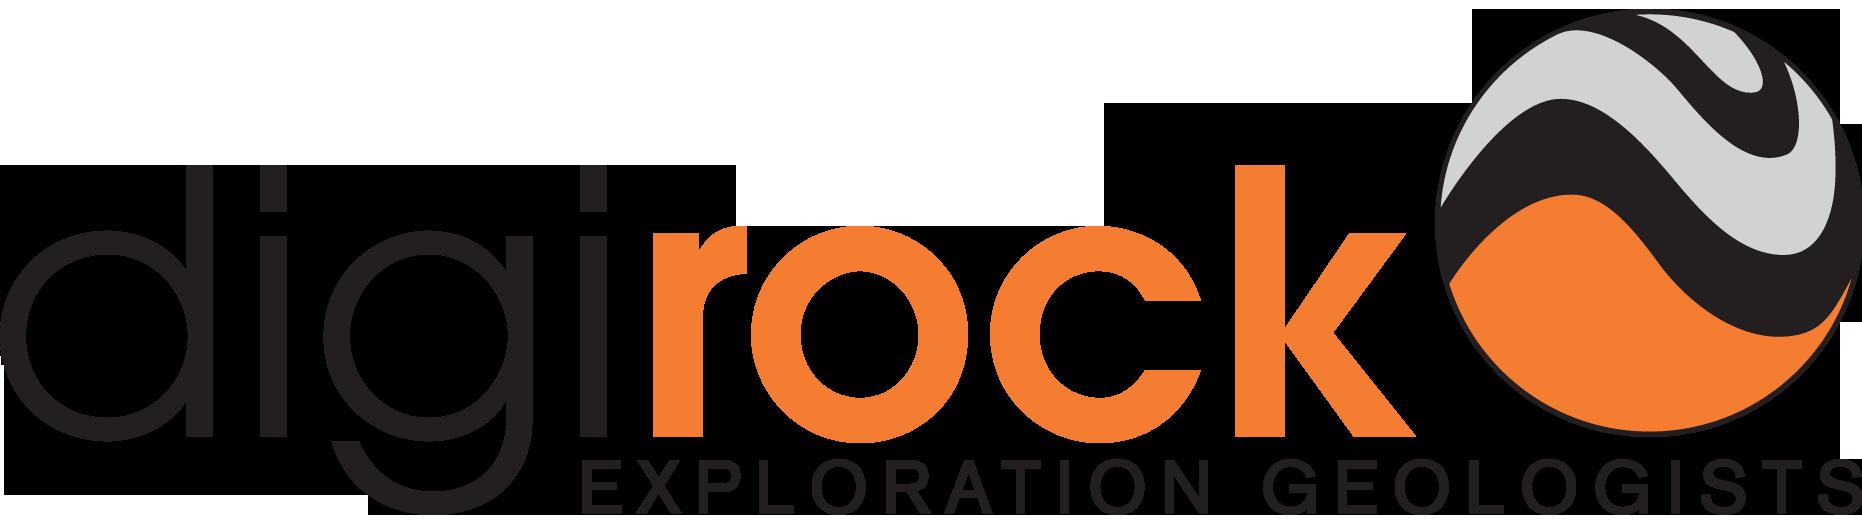 Digirock Logo No Background without cropping